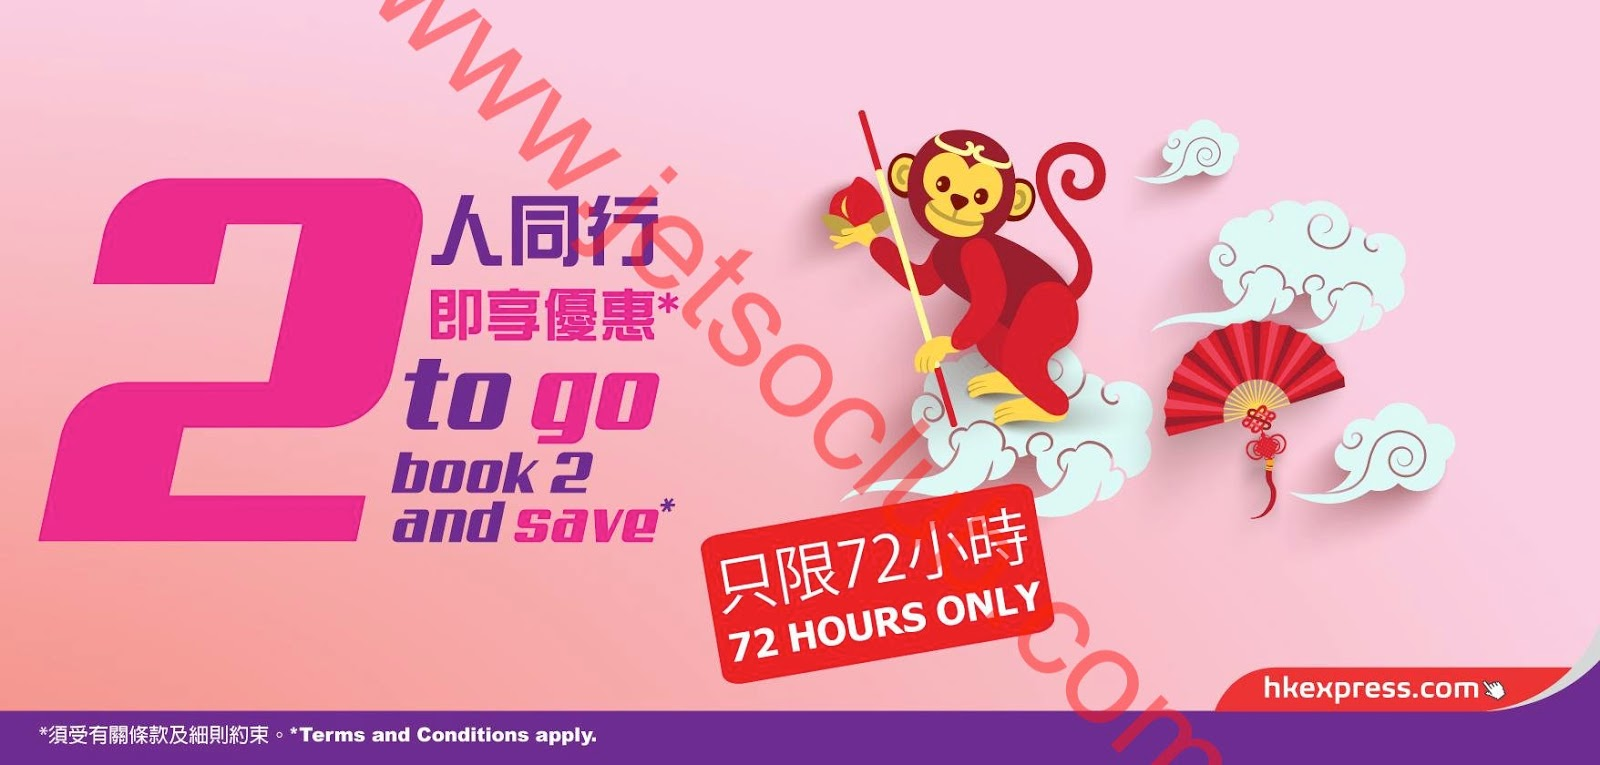 HK Express:2人同行 機票優惠 $99起(訂購:26-28/1) ( Jetso Club 著數俱樂部 )